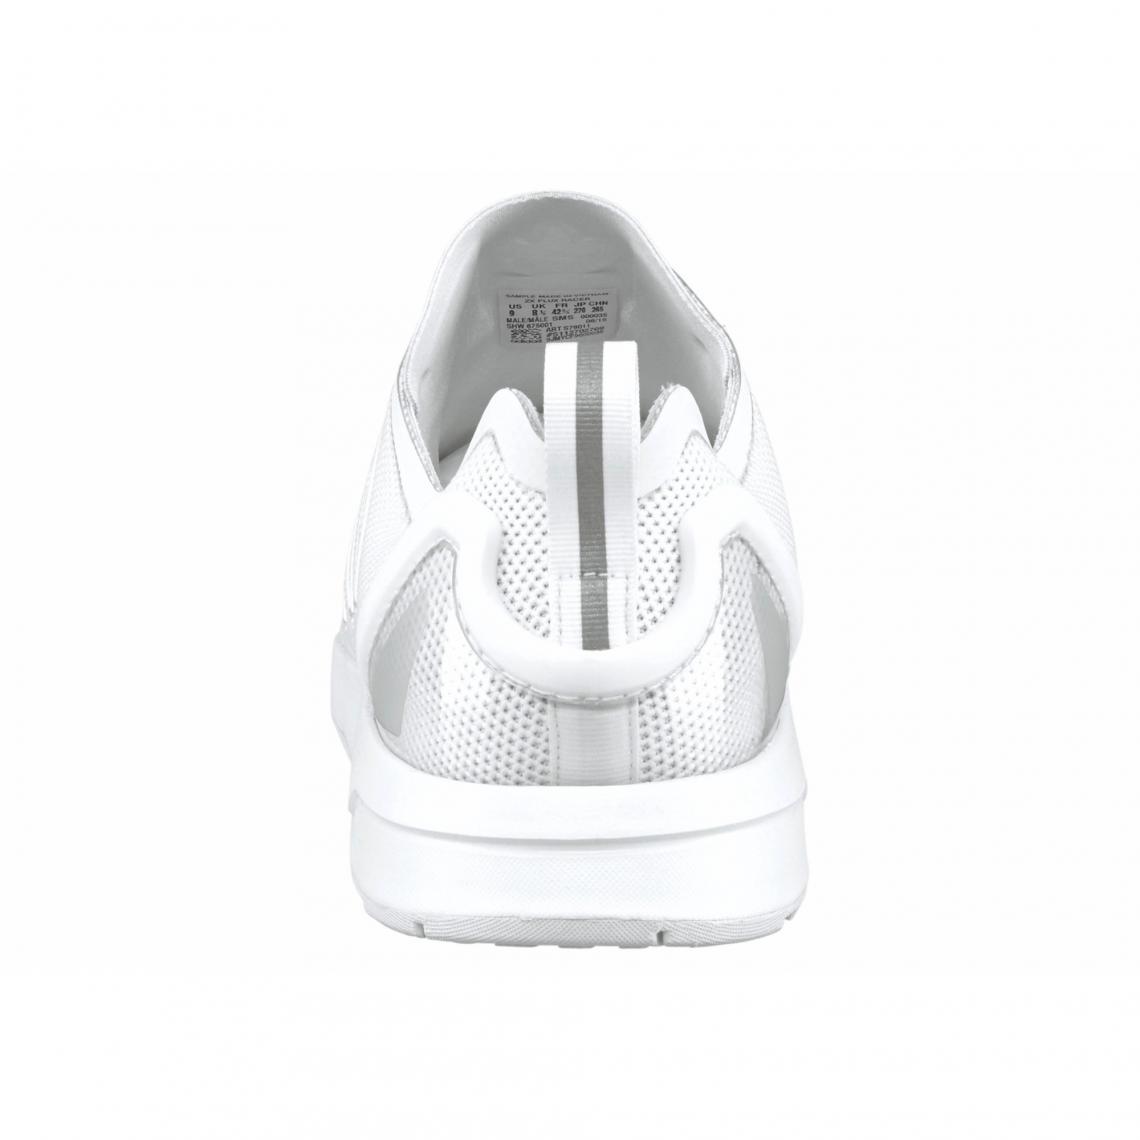 c0b700975926 adidas Originals ZX Flux ADV chaussures de running homme - Blanc Adidas  Originals